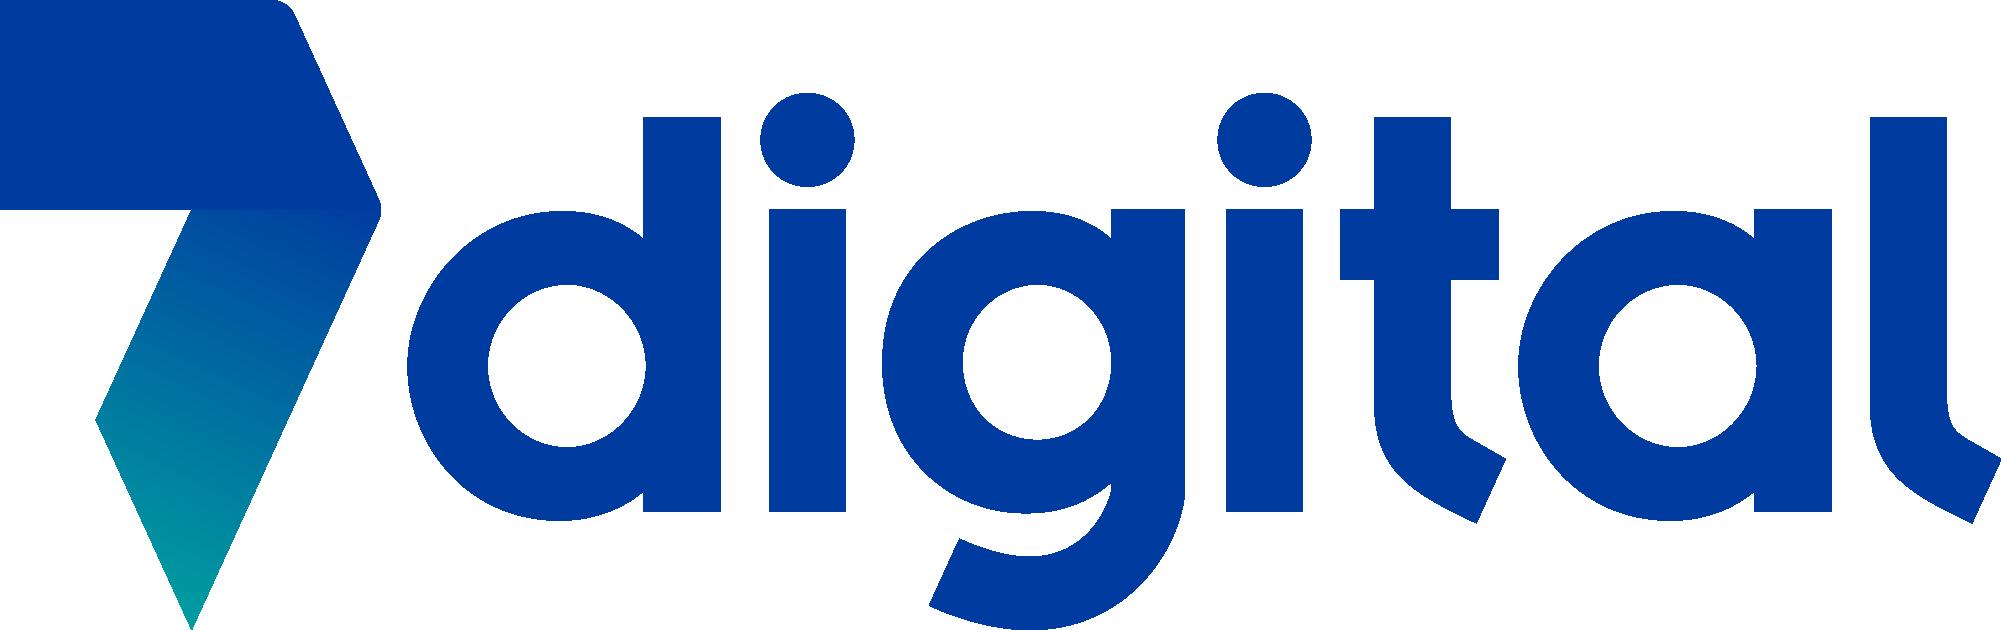 7DIGITAL GROUP PLC Logo